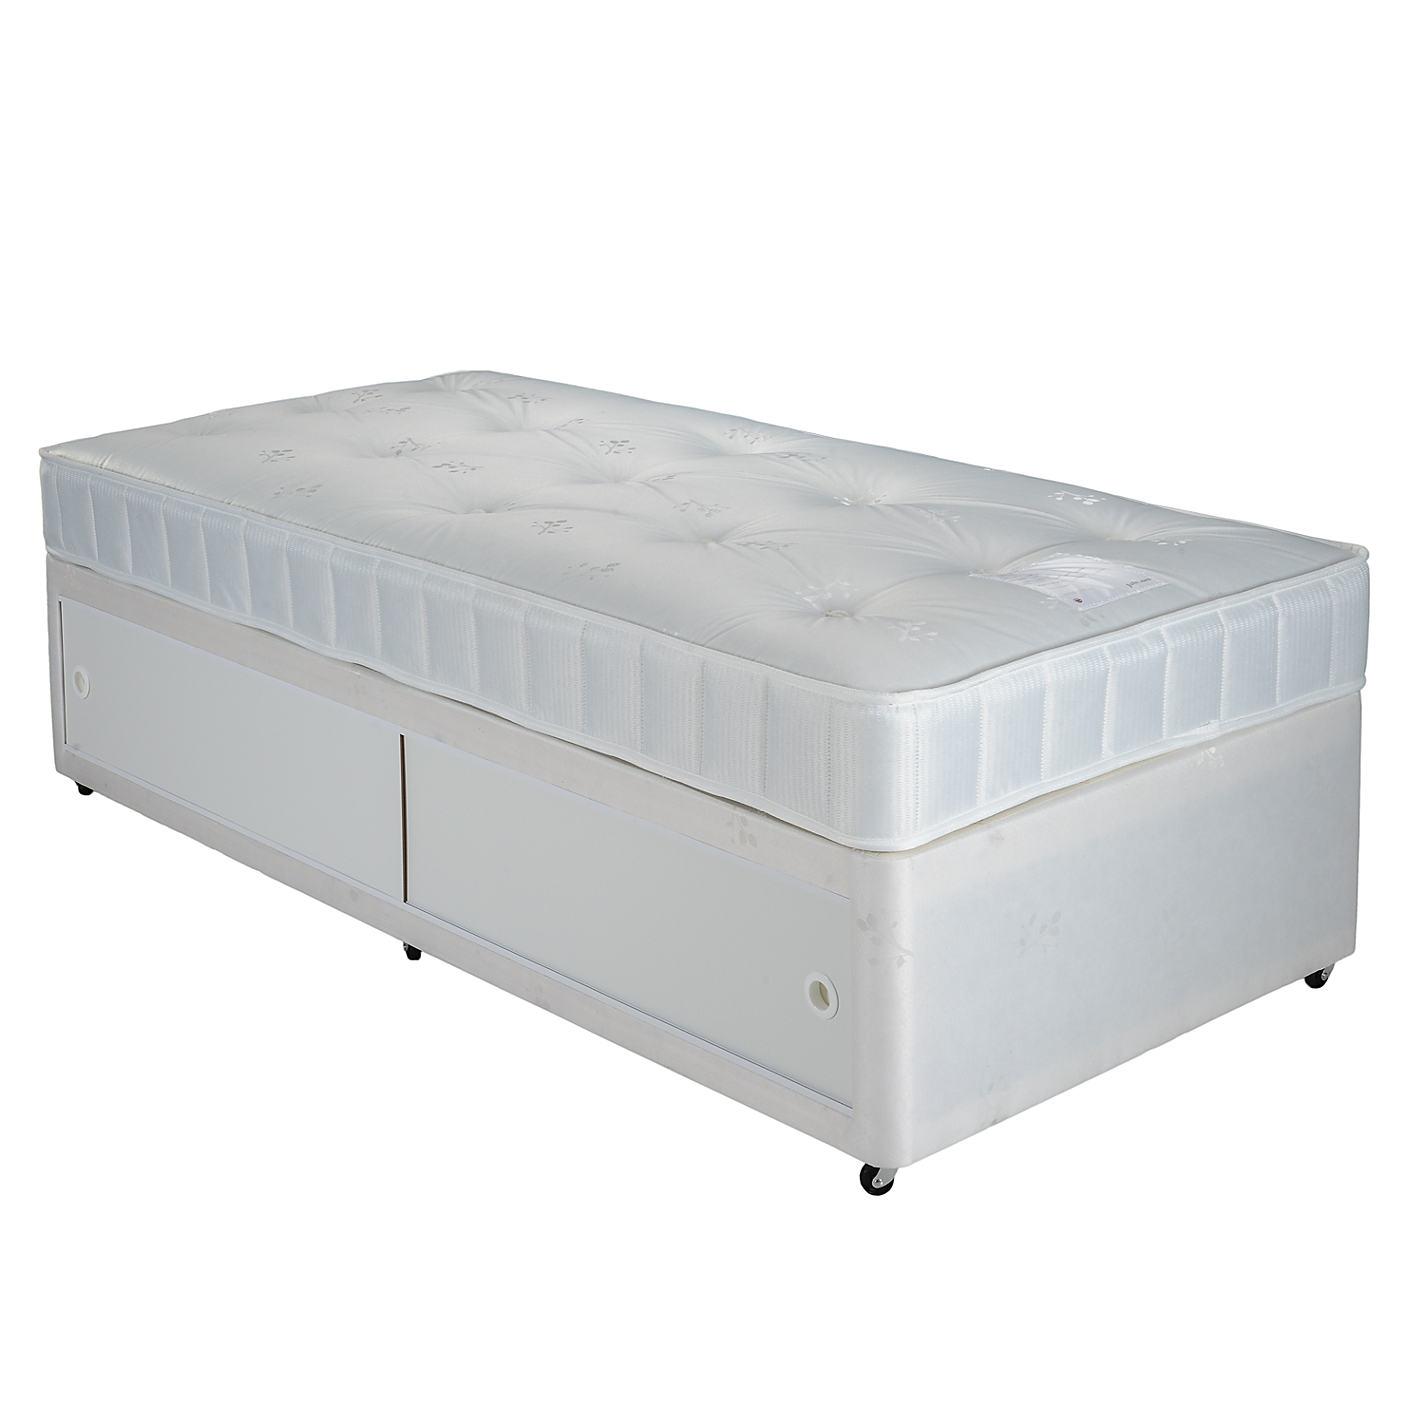 John Lewis The Basics Collection Comfort Slide Divan Storage Bed And Mattress Set